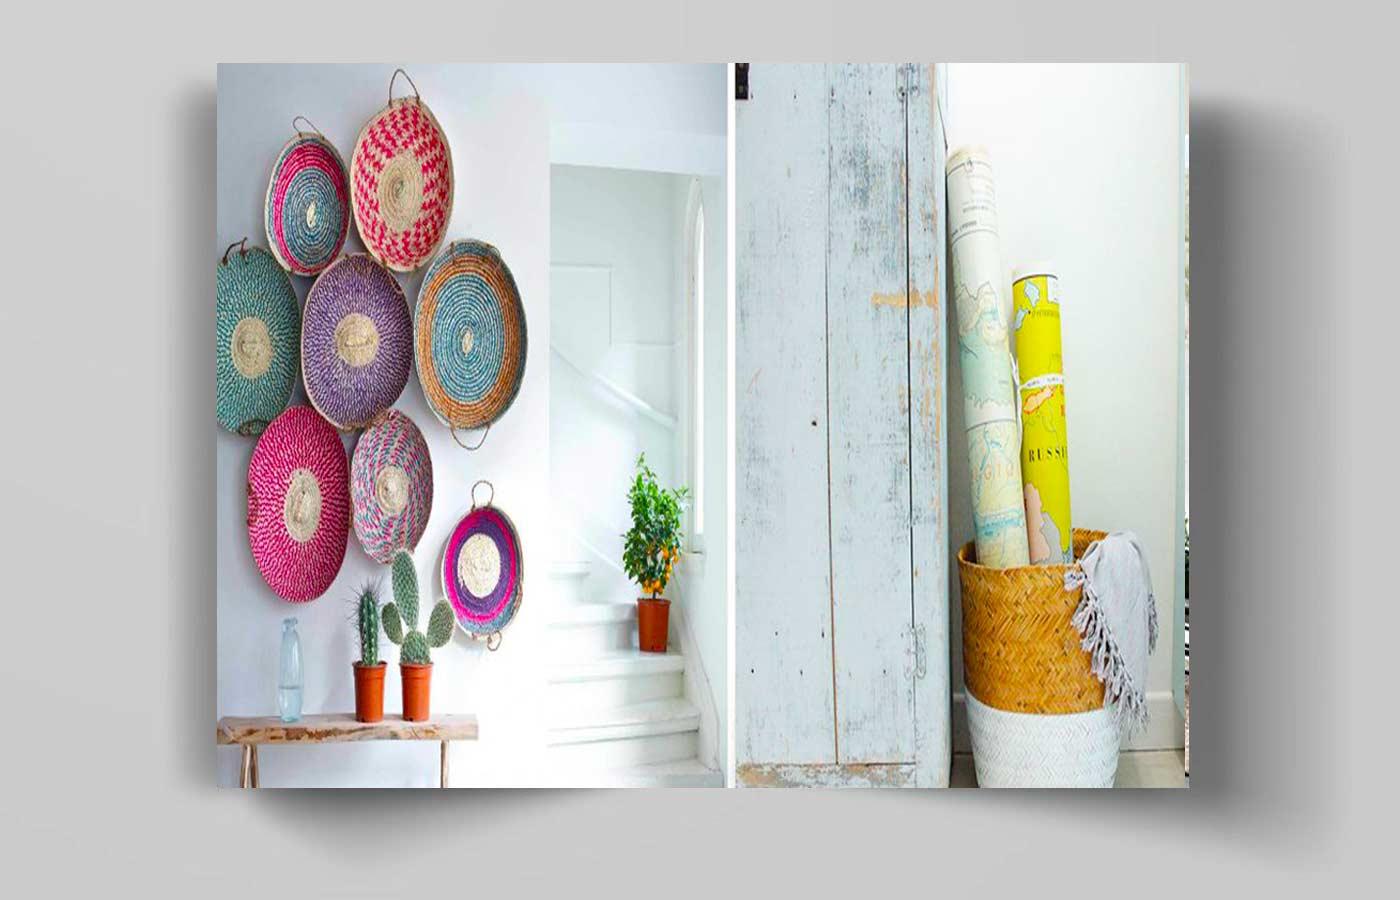 194rt - انواع آویز دیواری در دکوراسیون منزل